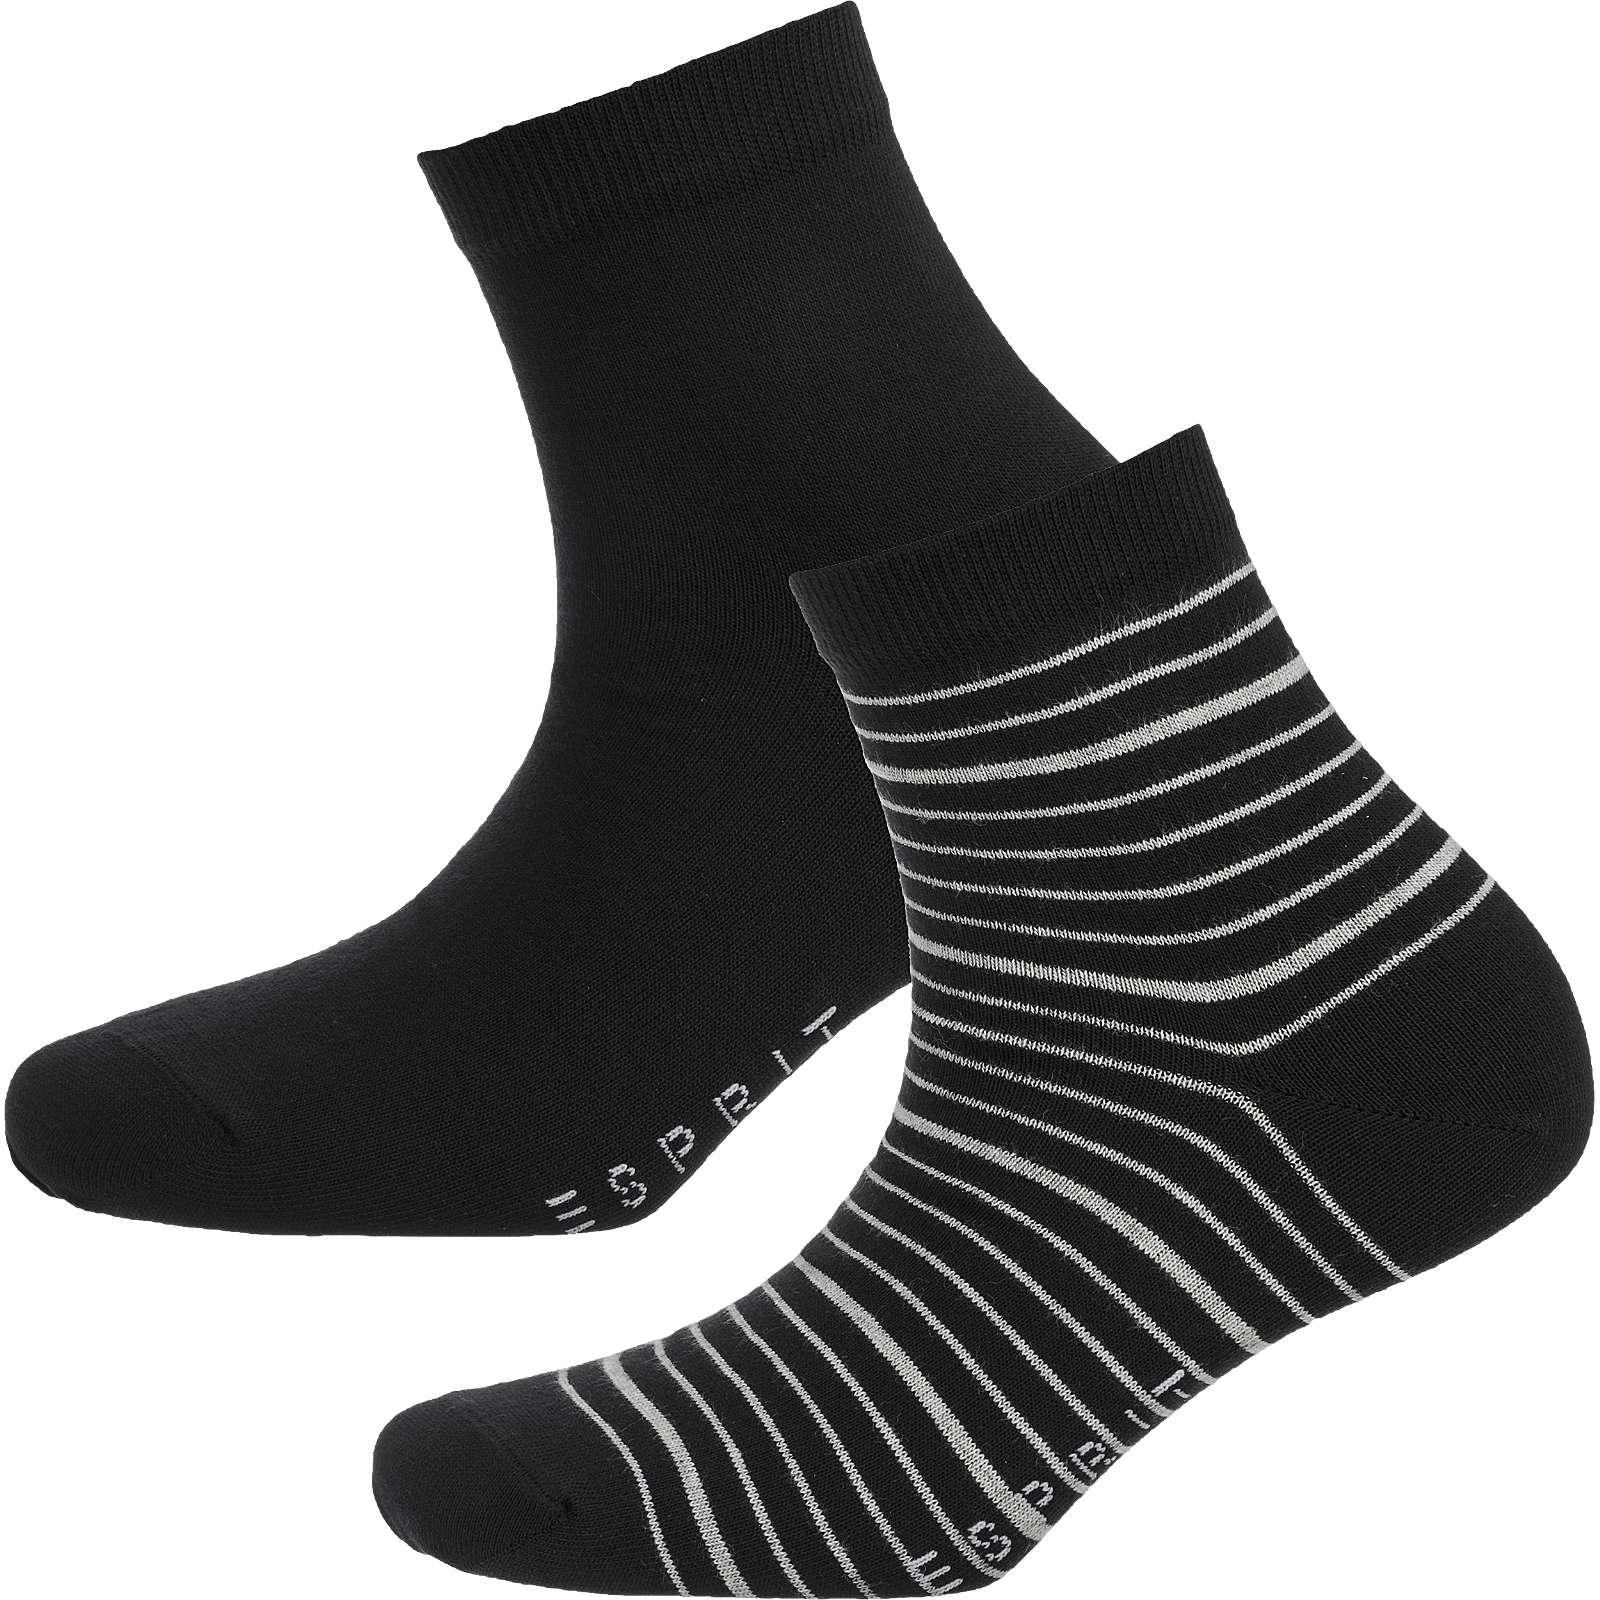 ESPRIT 2 Paar Socken schwarz Damen Gr. 35-38